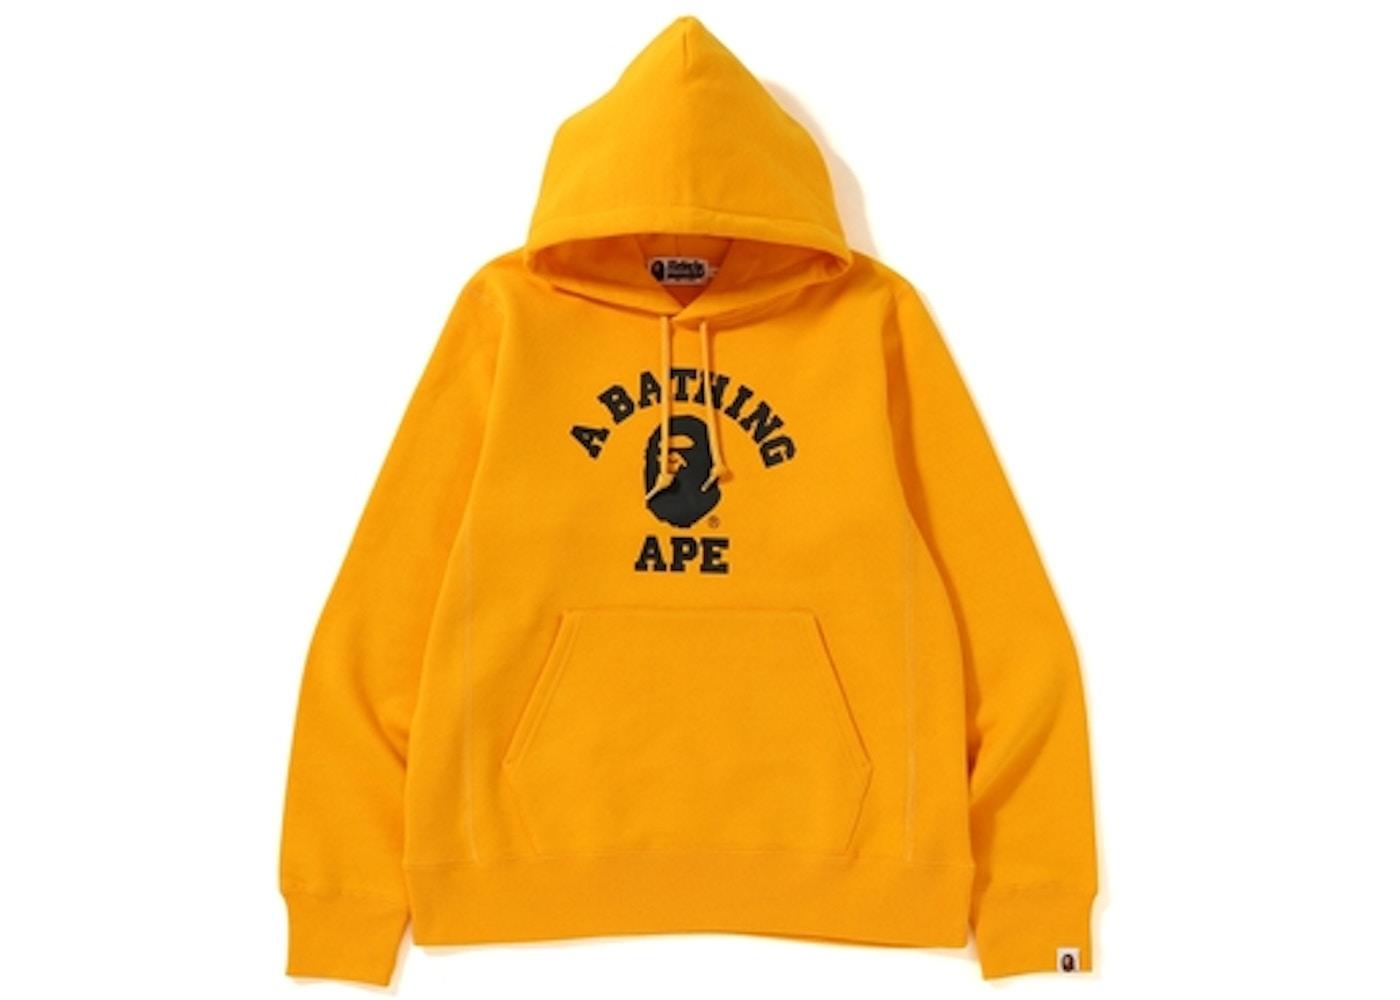 526ca666de1b BAPE College Heavy Weight Pullover Hoodie Yellow - FW18